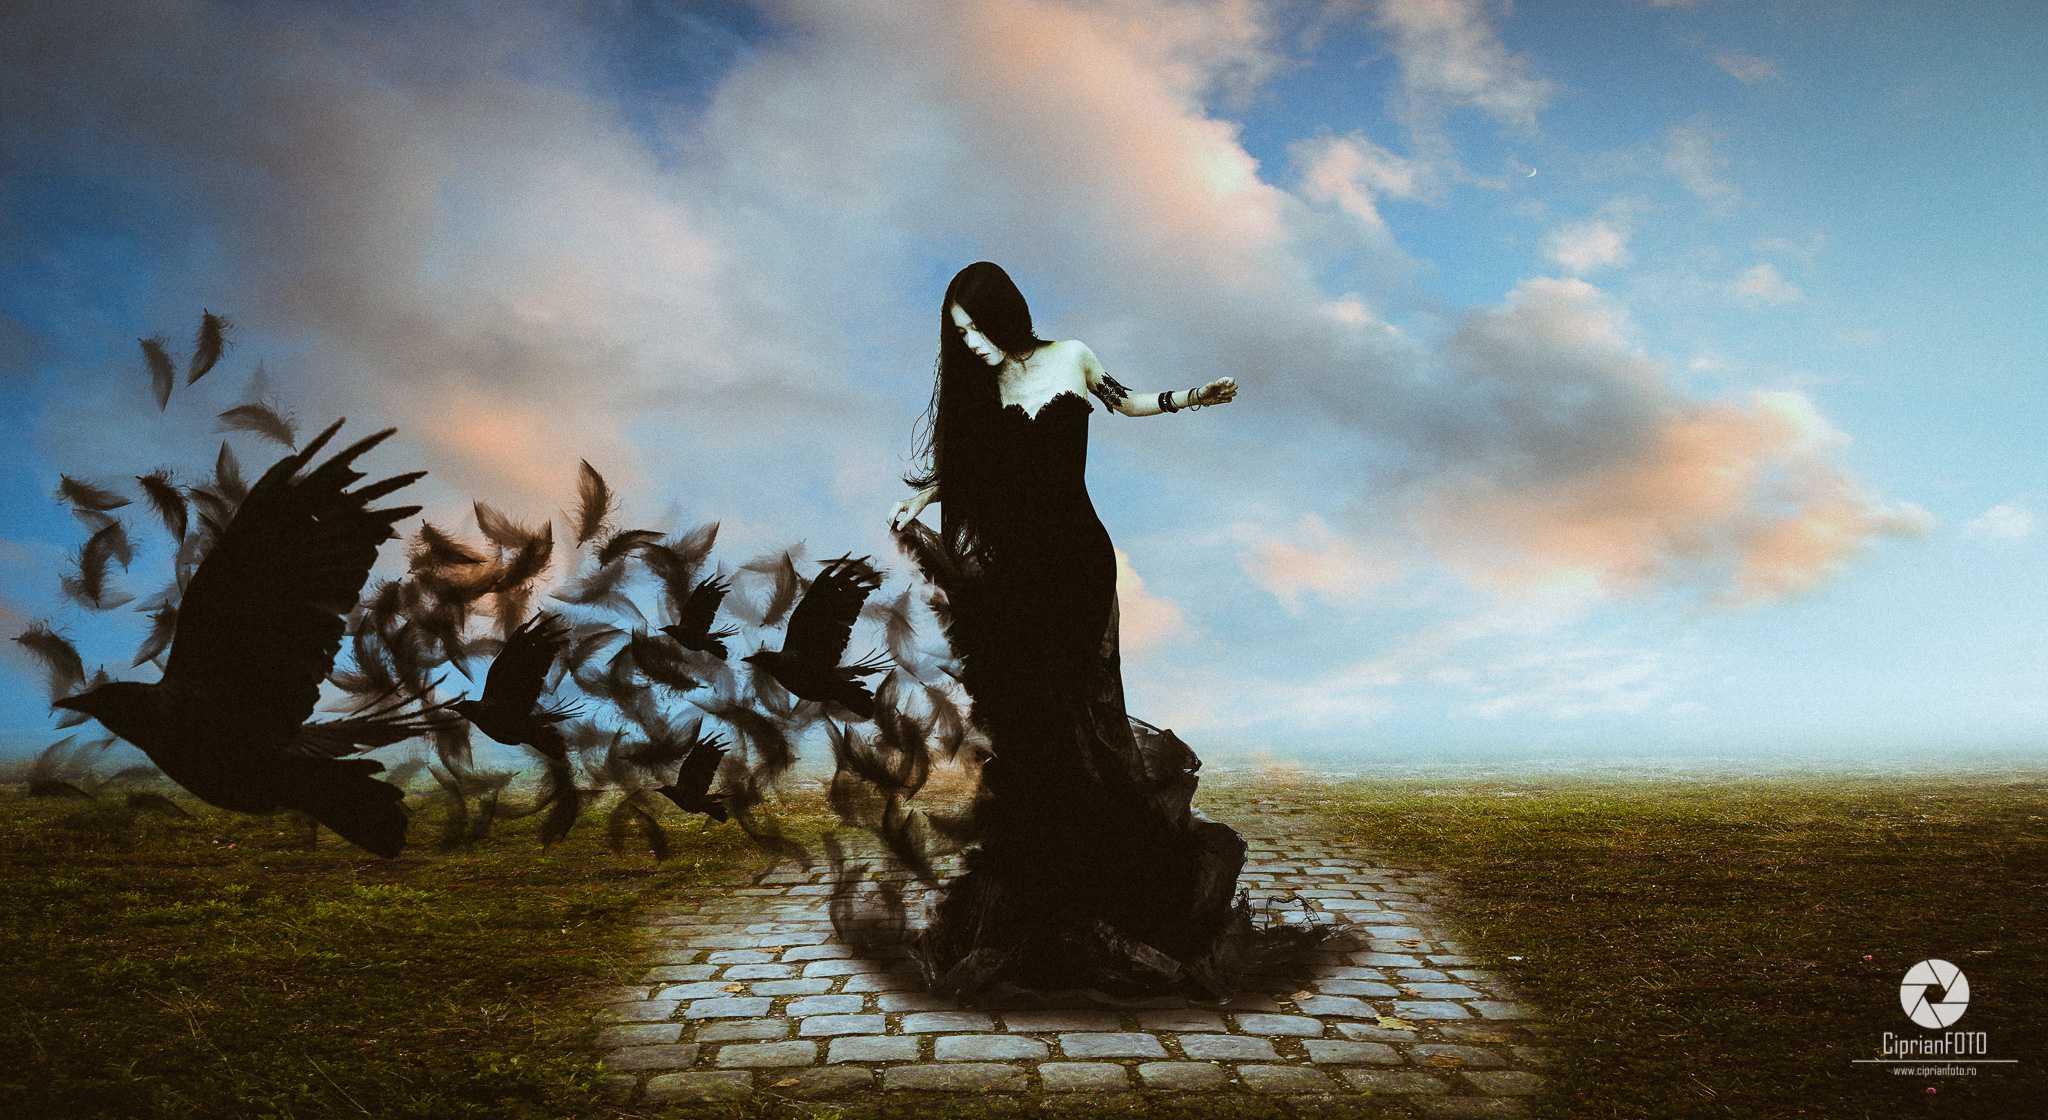 Mother_Of_The_Ravens_Photoshop_Manipulation_Tutorial_CiprianFOTO